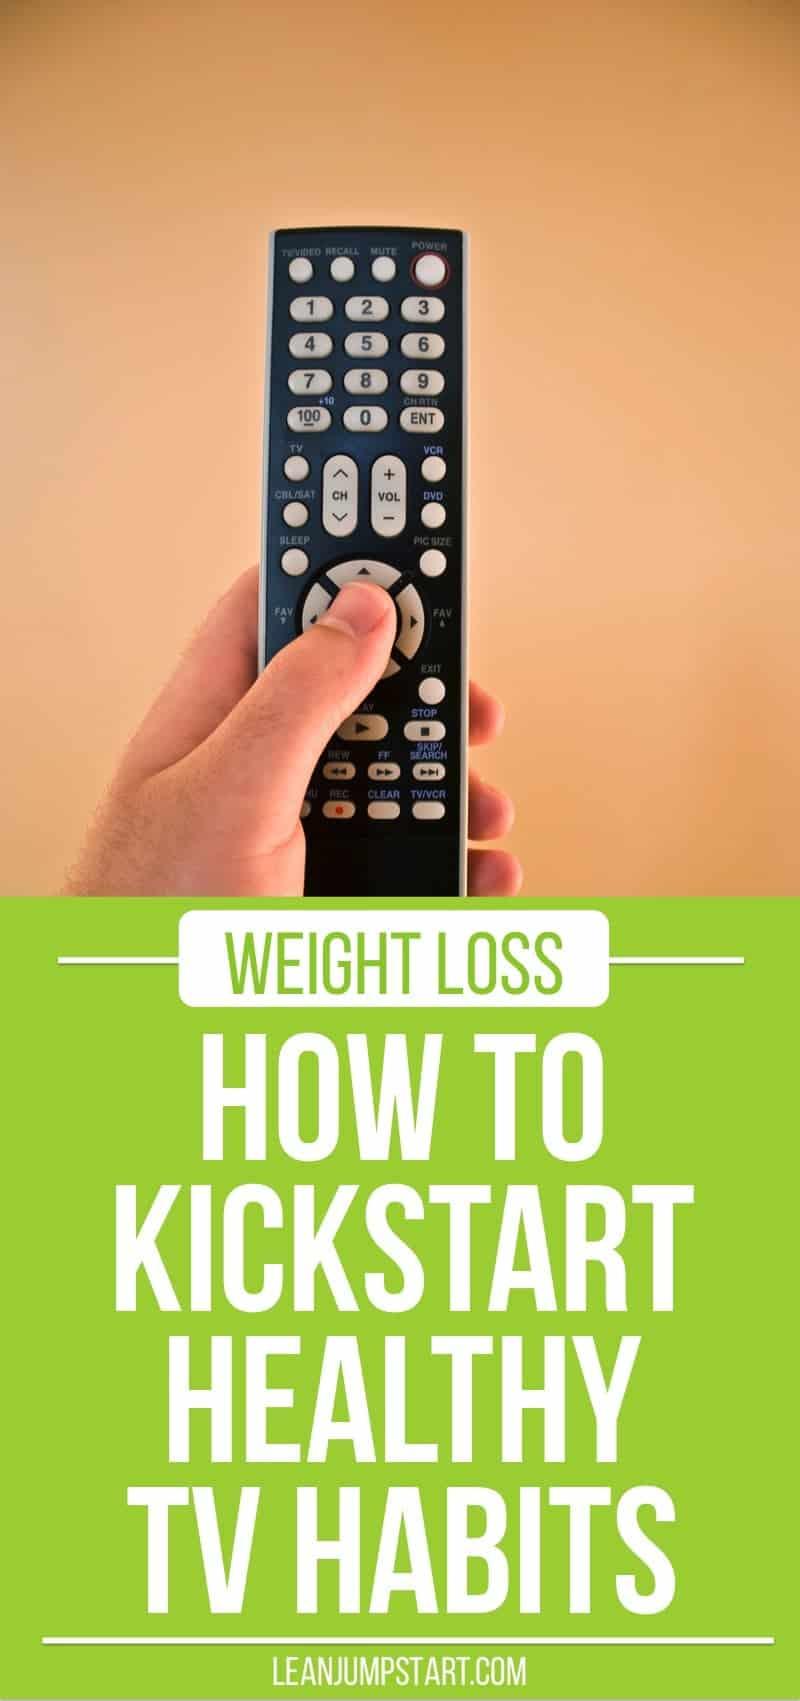 TV Habits: how to kickstart healthier TV habits